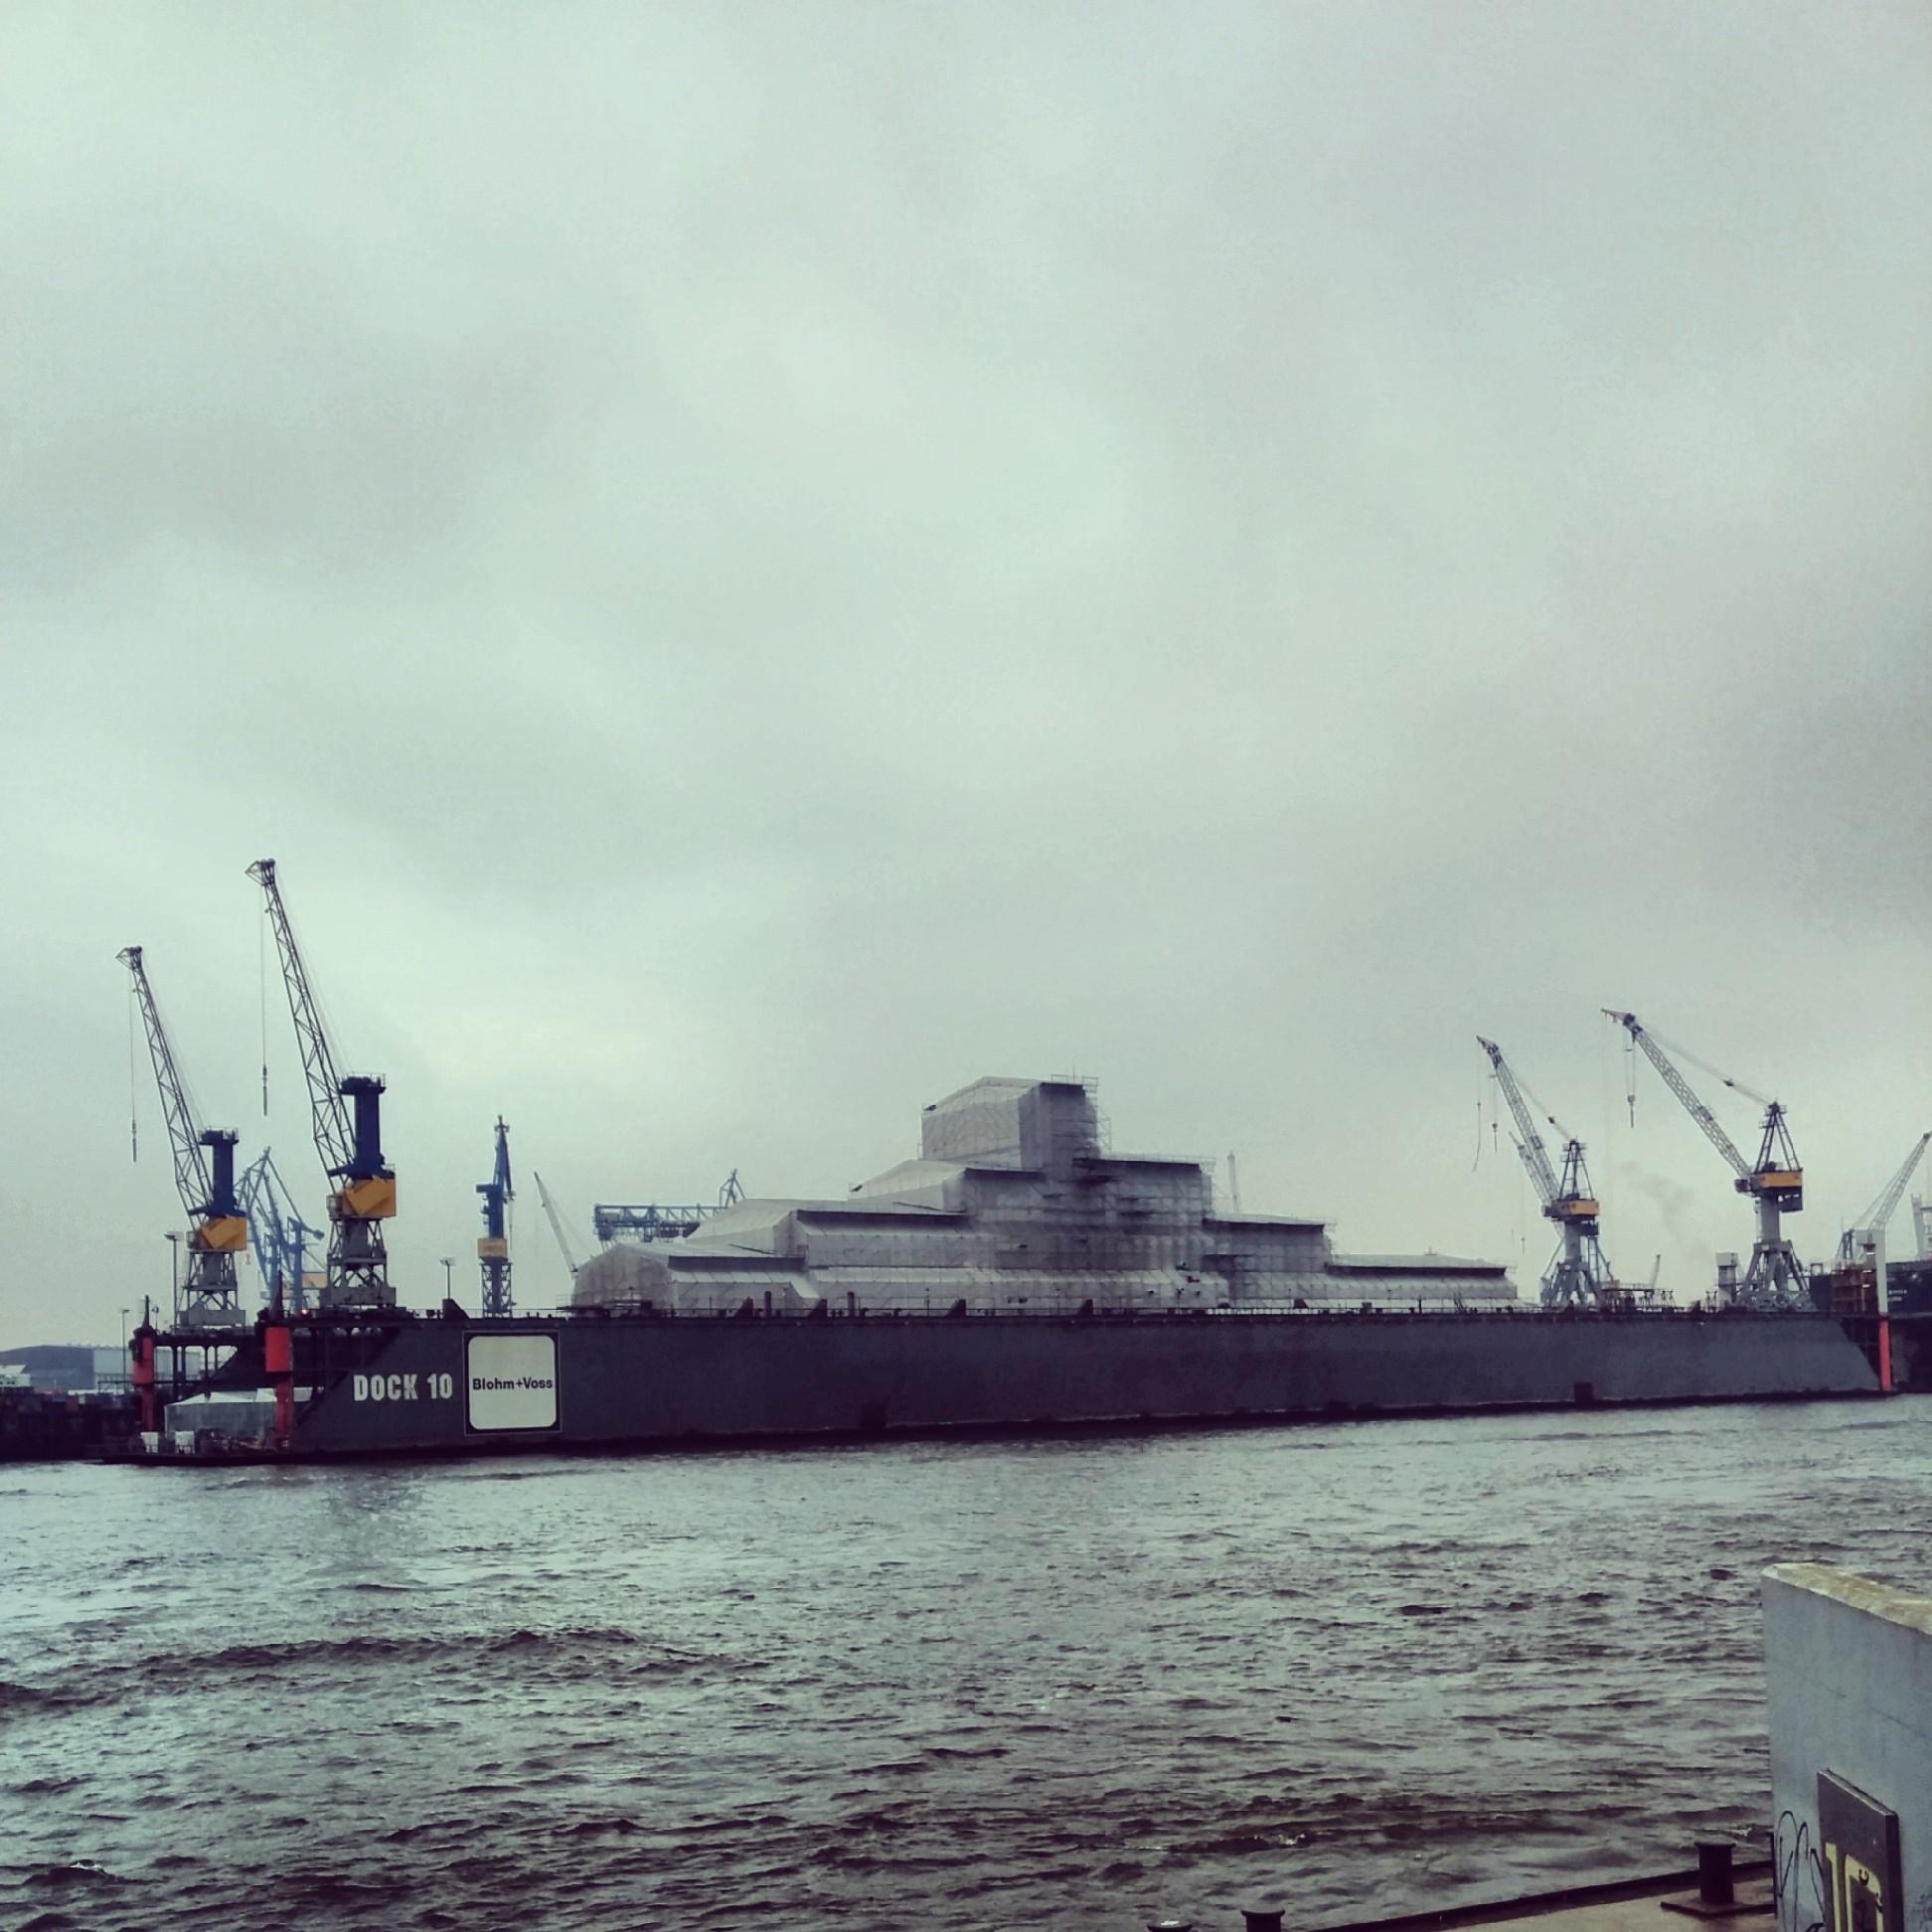 Dock 10 Blohm&Voss